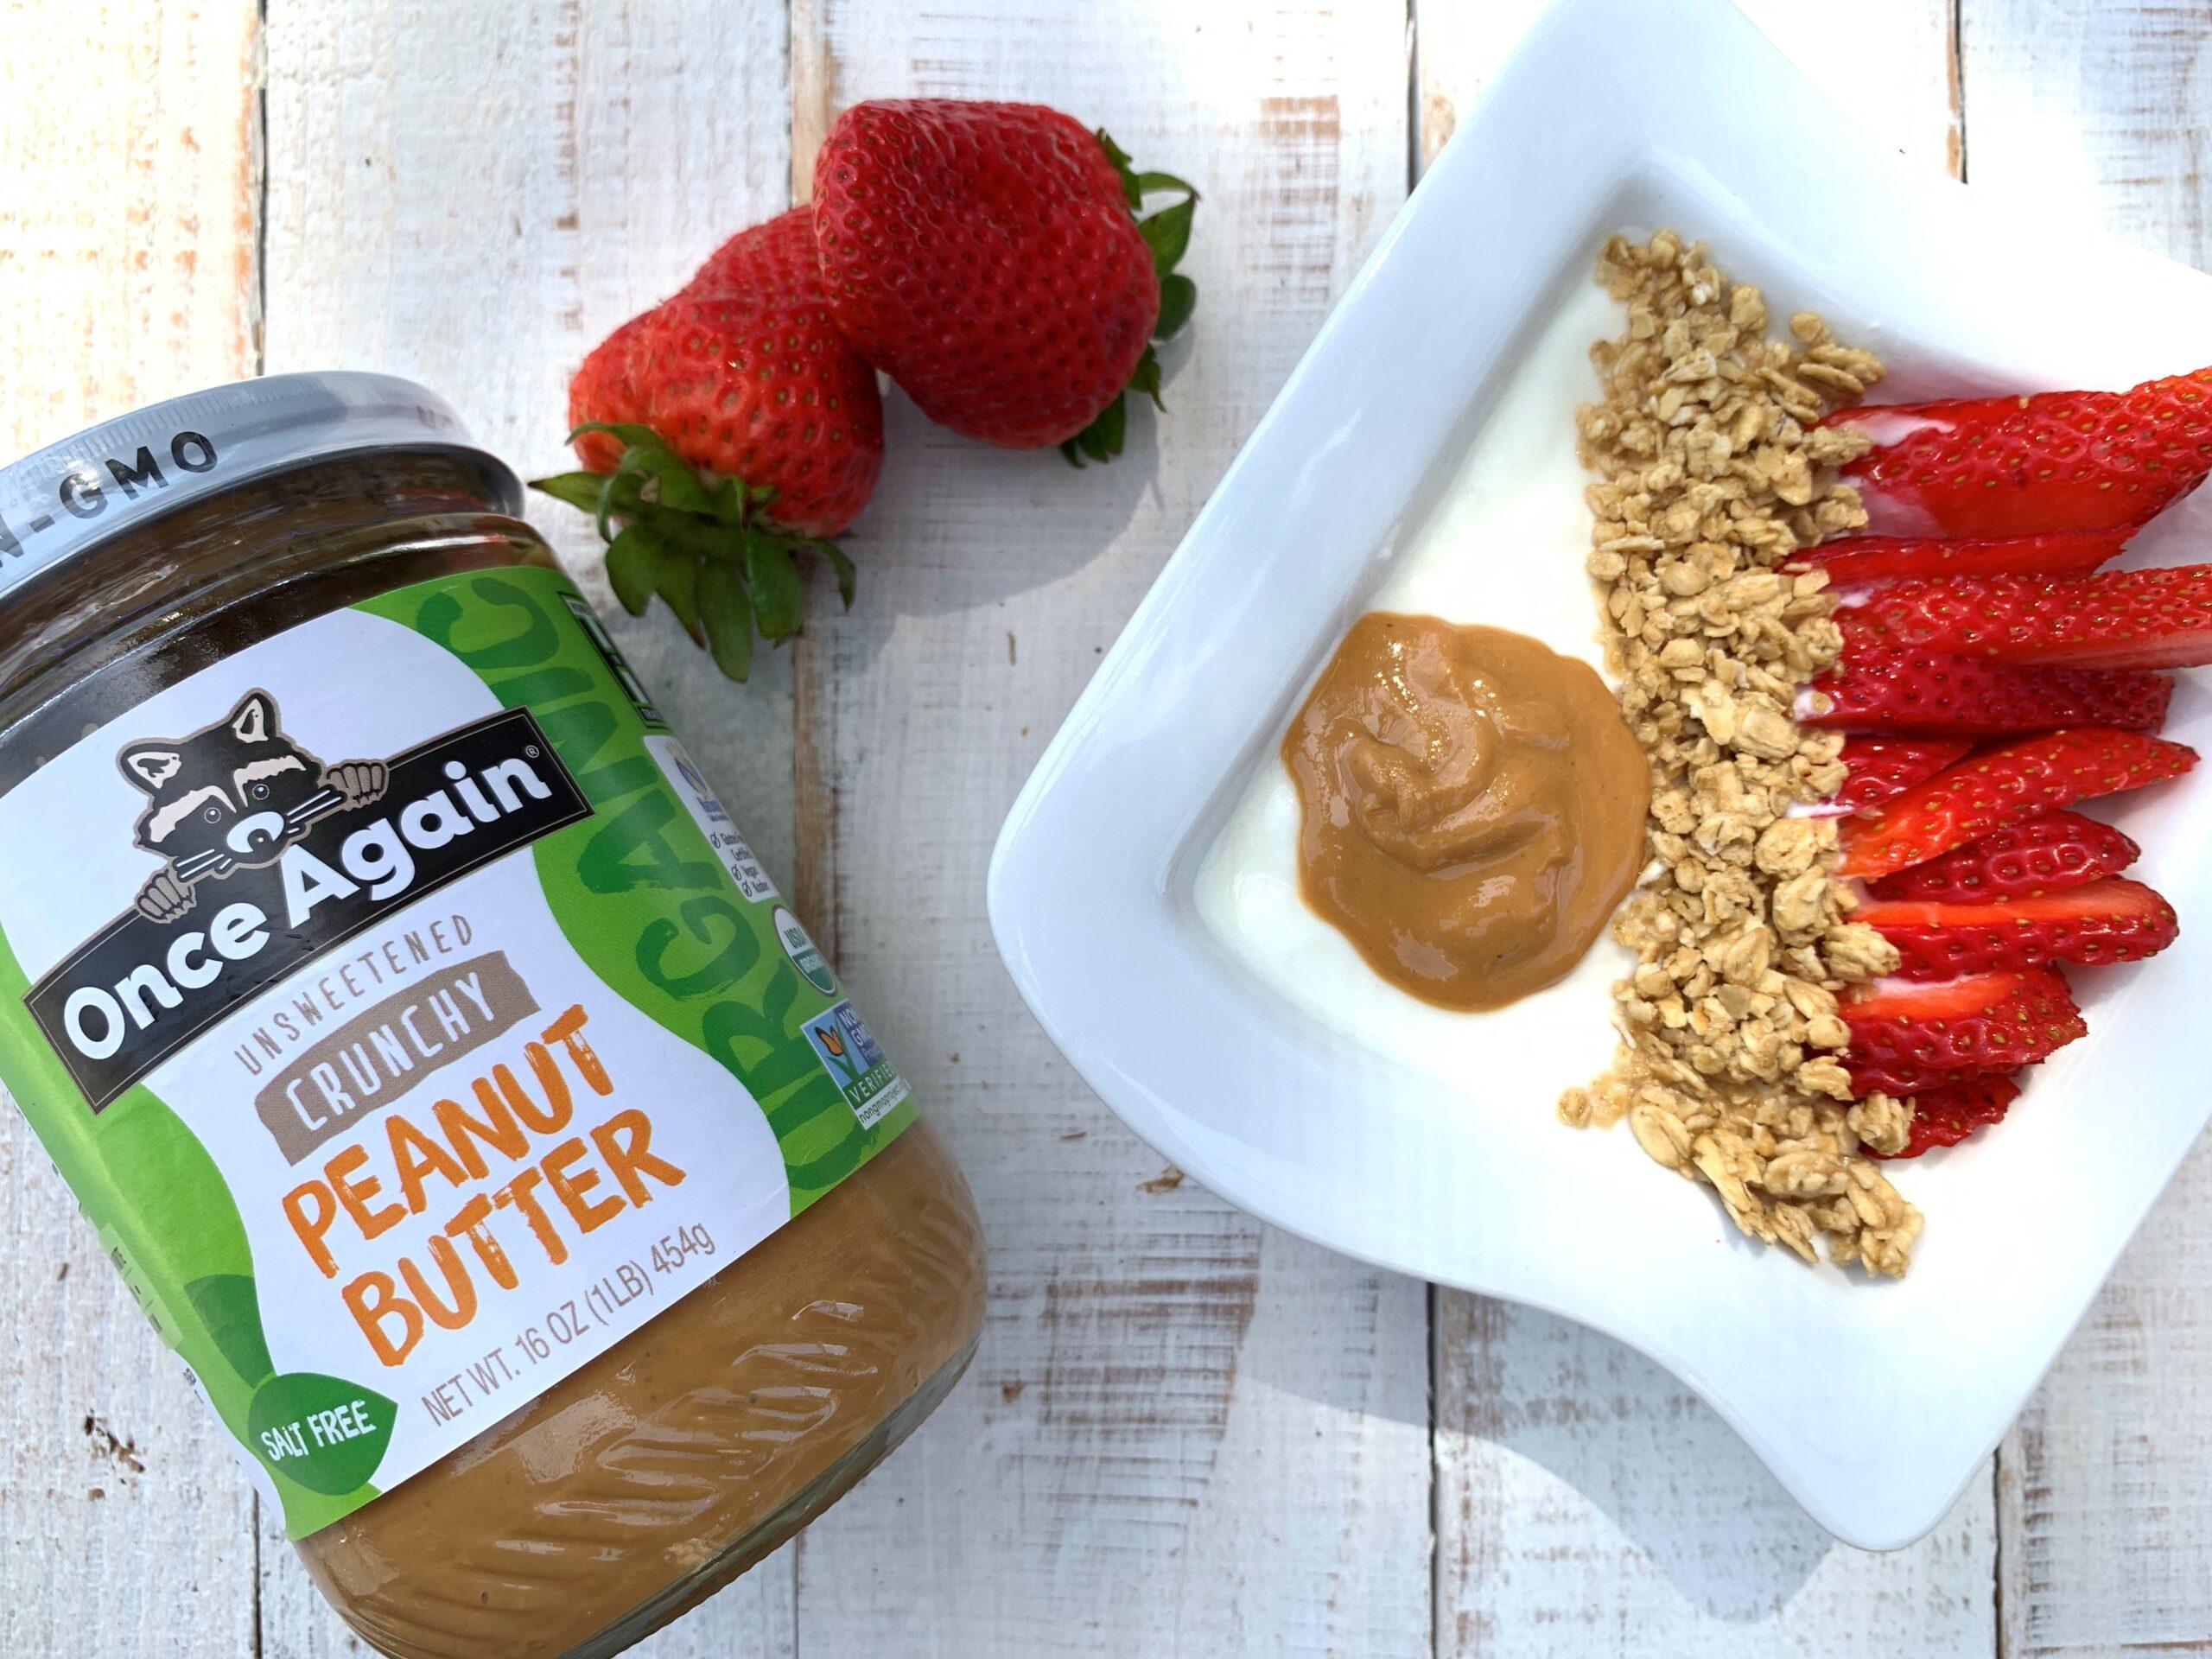 peanut butter yogur